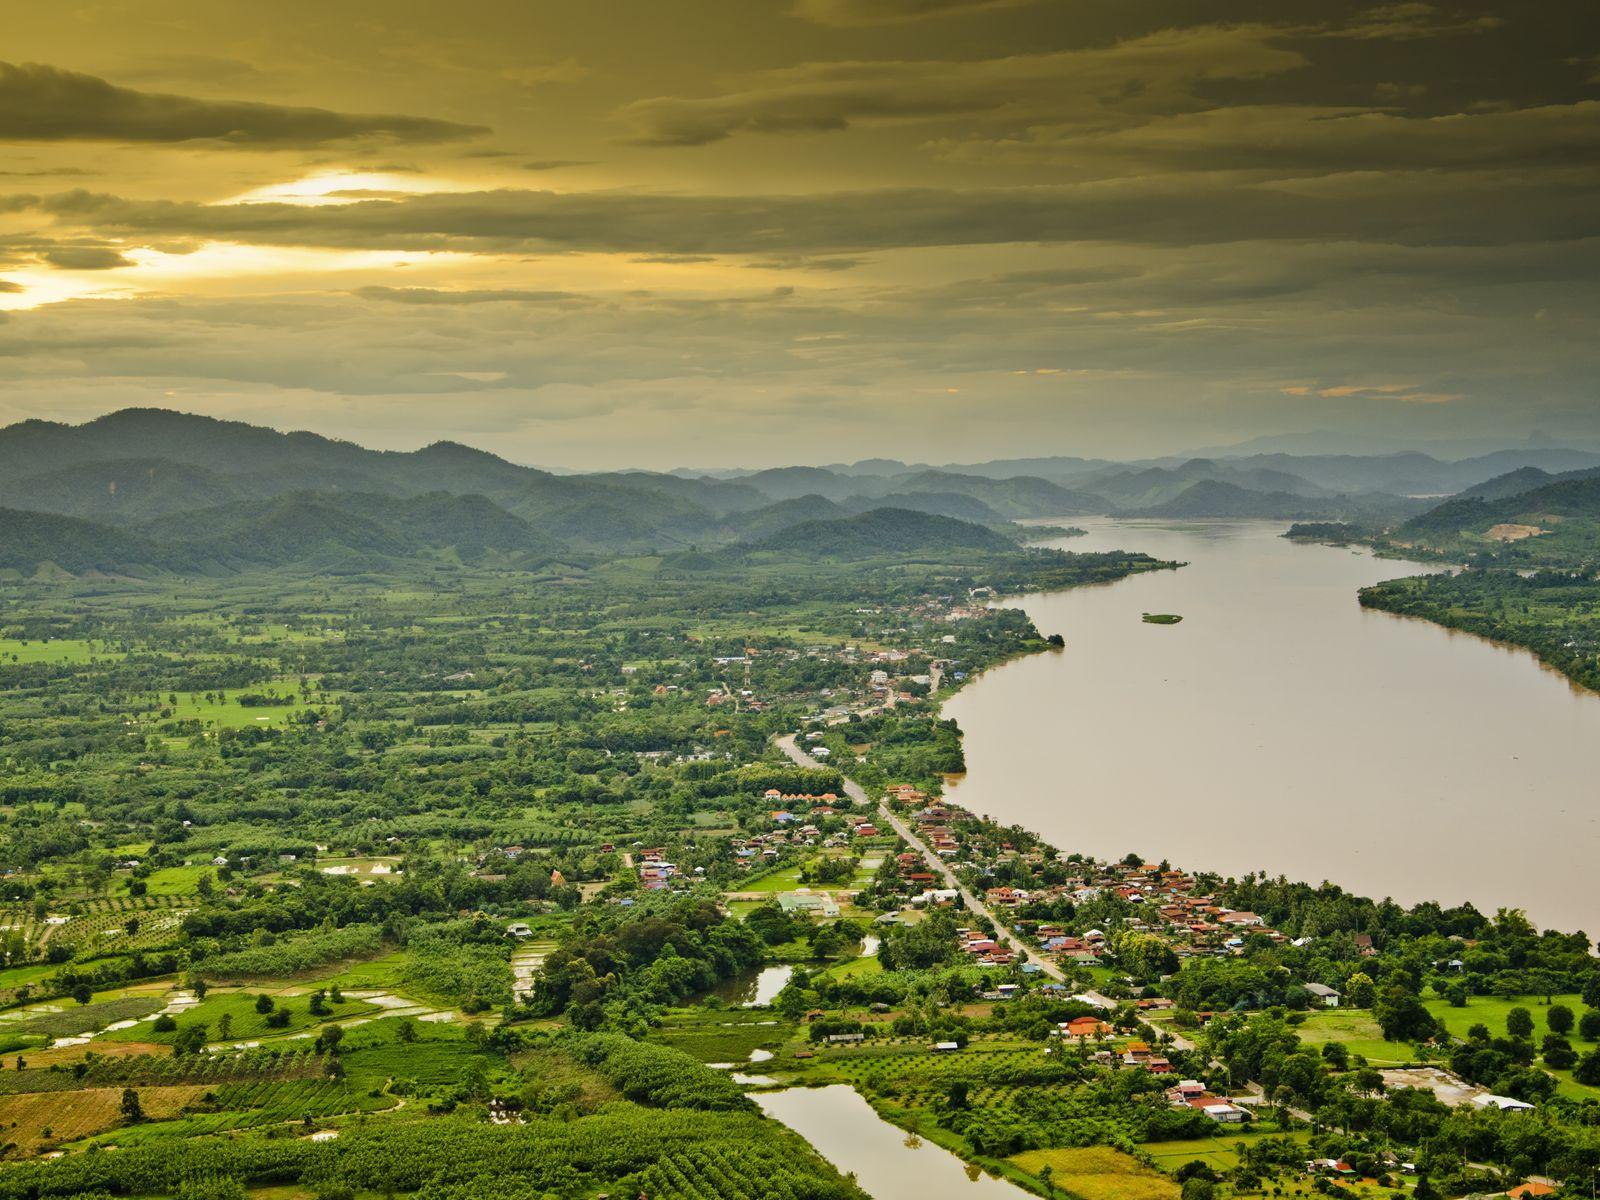 Nong Khai Province Selected Local Experiences